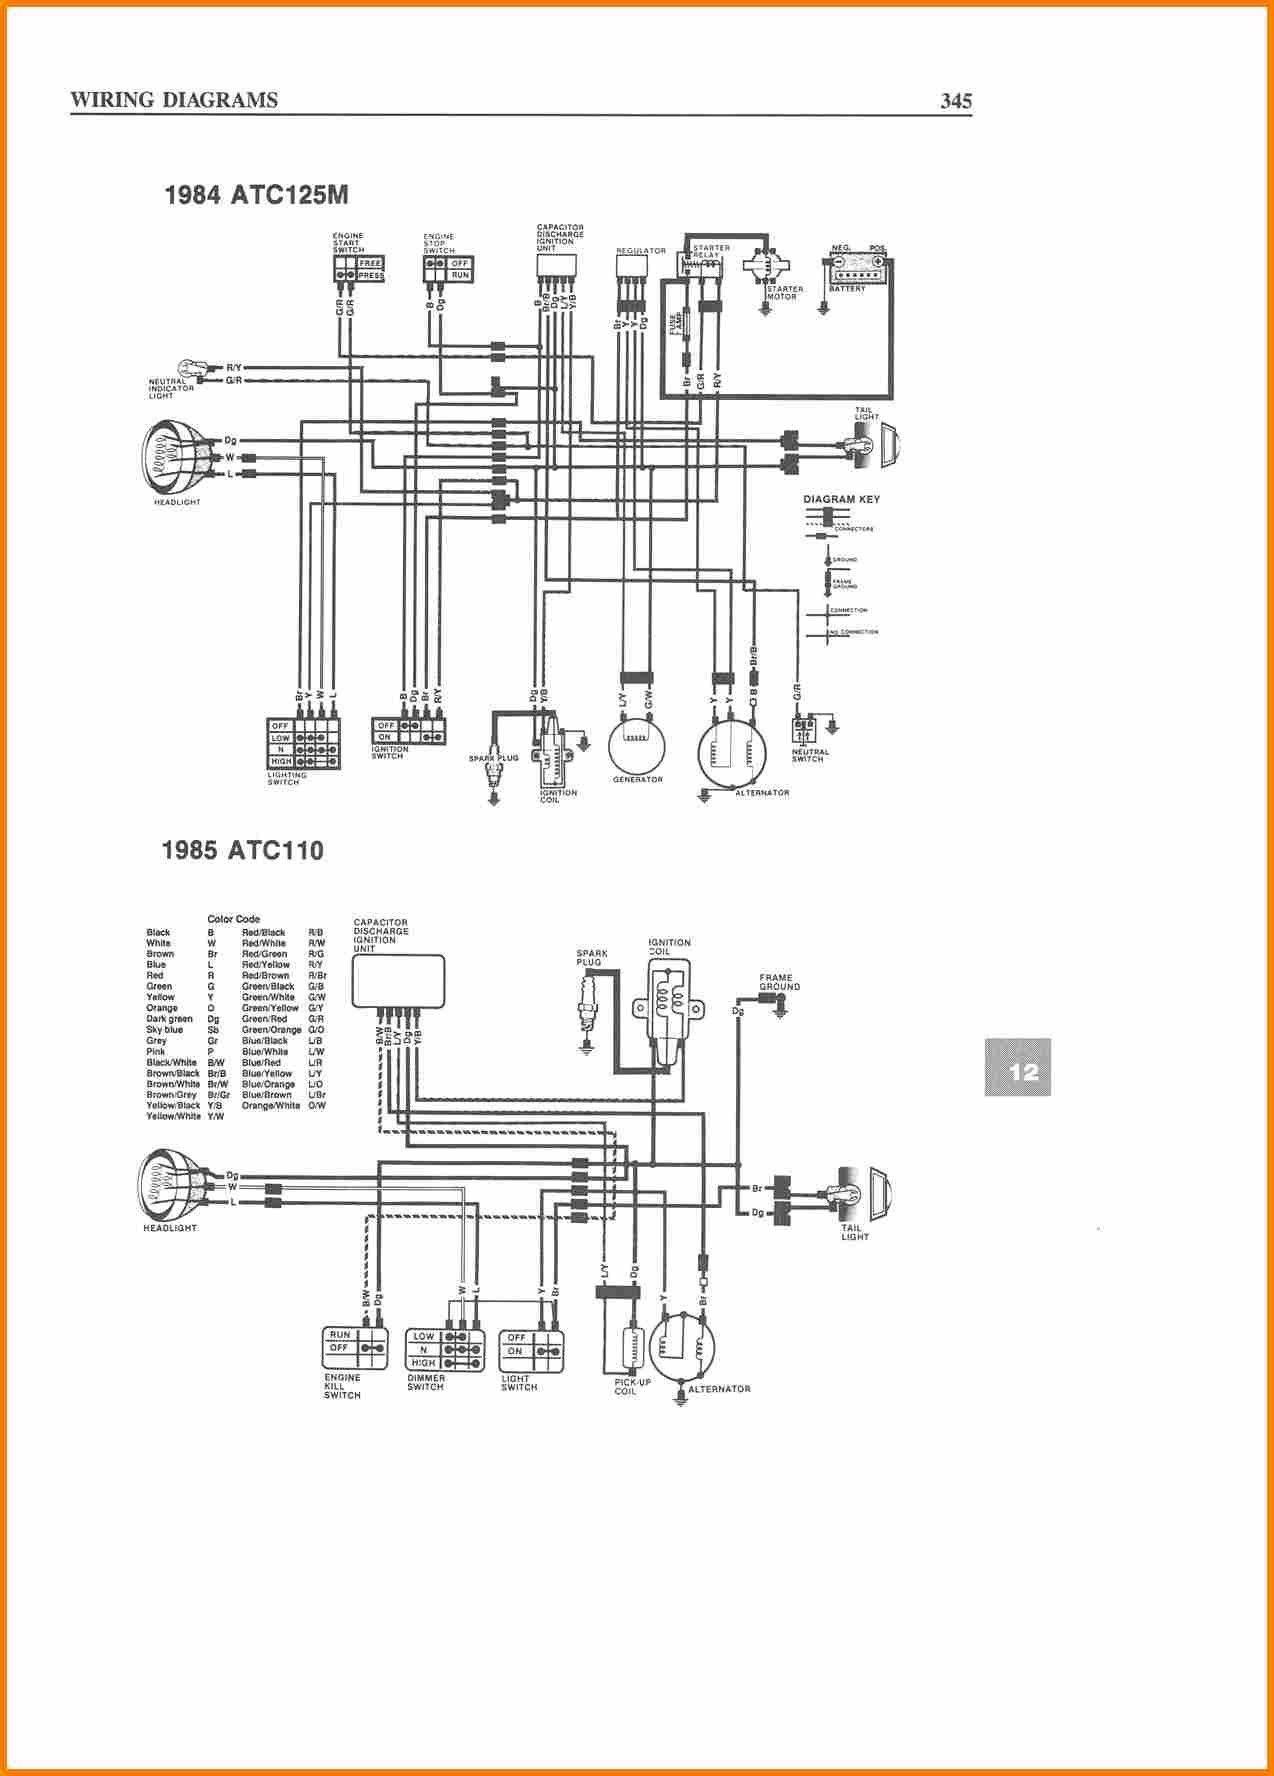 New Simple Electrical Wiring Diagram Wiringdiagram